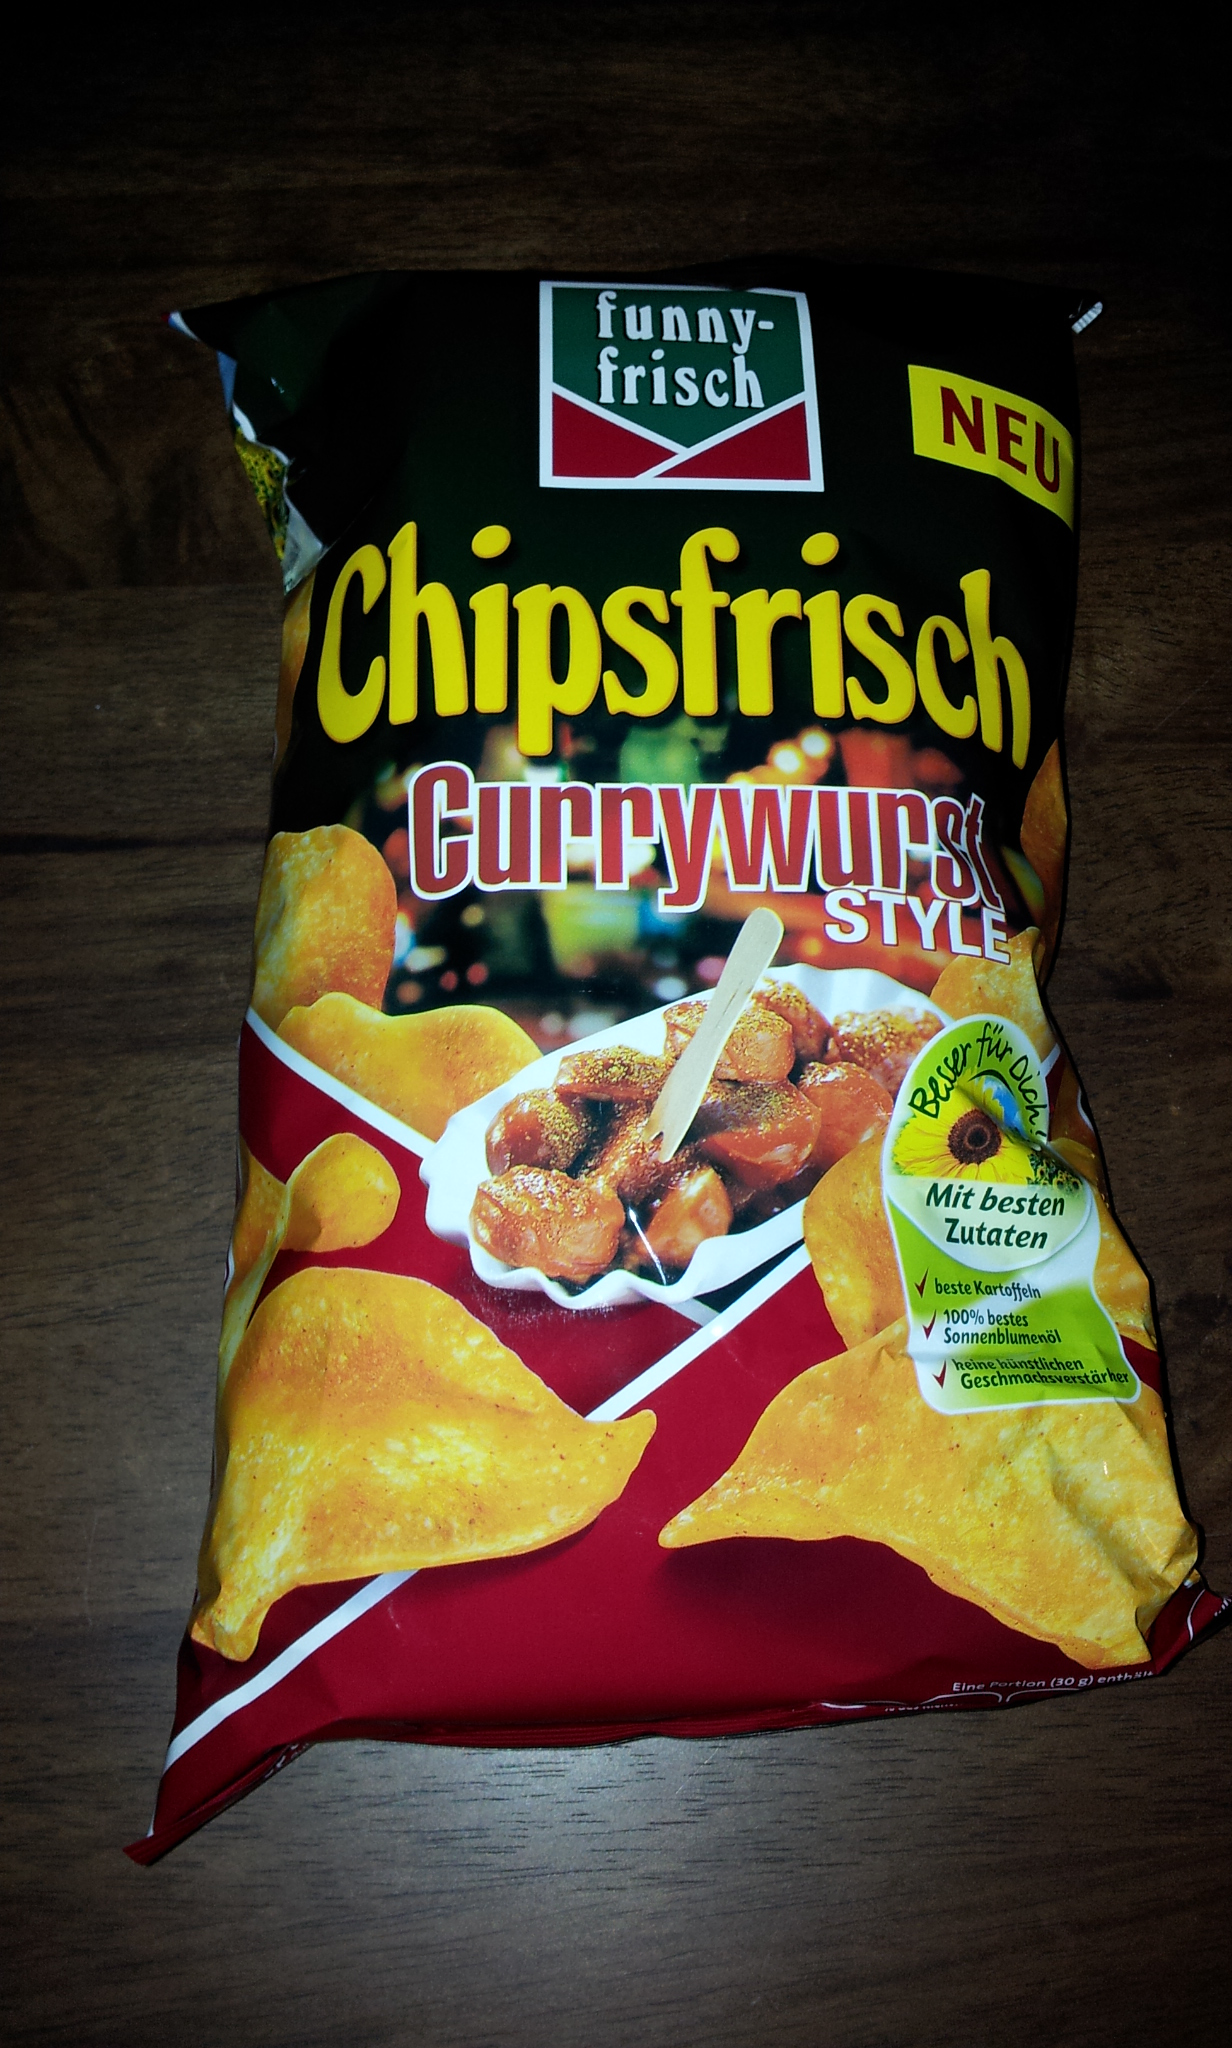 http://foodloader.net/Holz_2011-12-07_Chipsfrisch_Currywurst.jpg